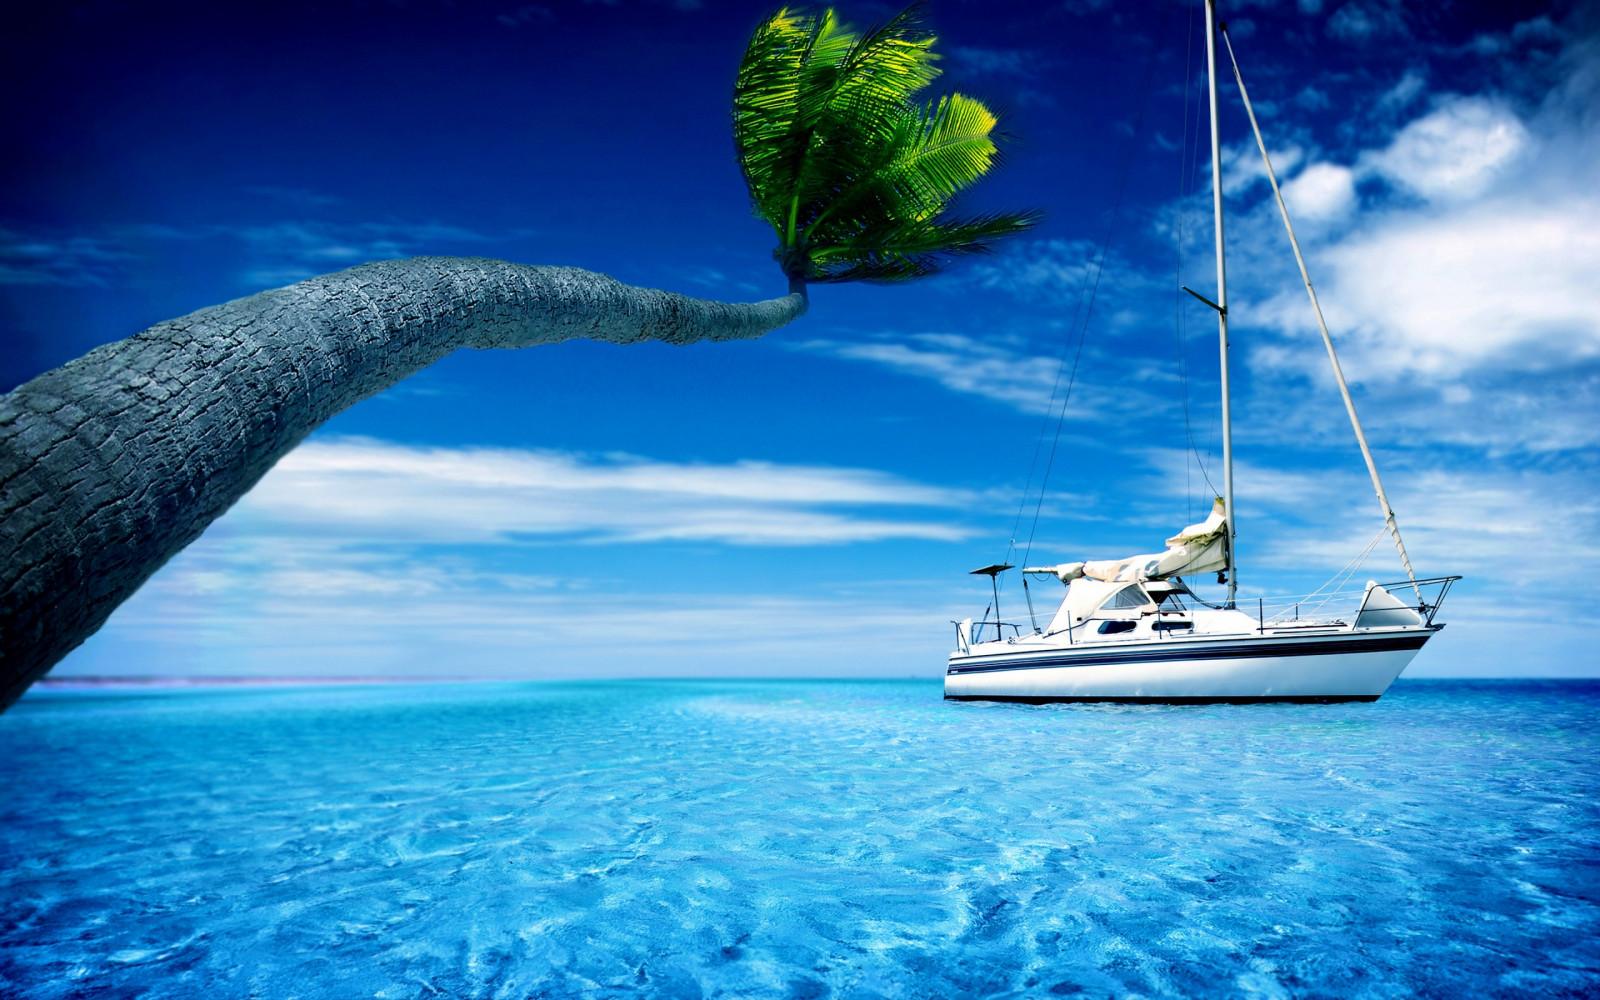 Segelboot karibik  Hintergrundbilder : Schiff, Boot, Meer, Fahrzeug, blau, Yachten ...